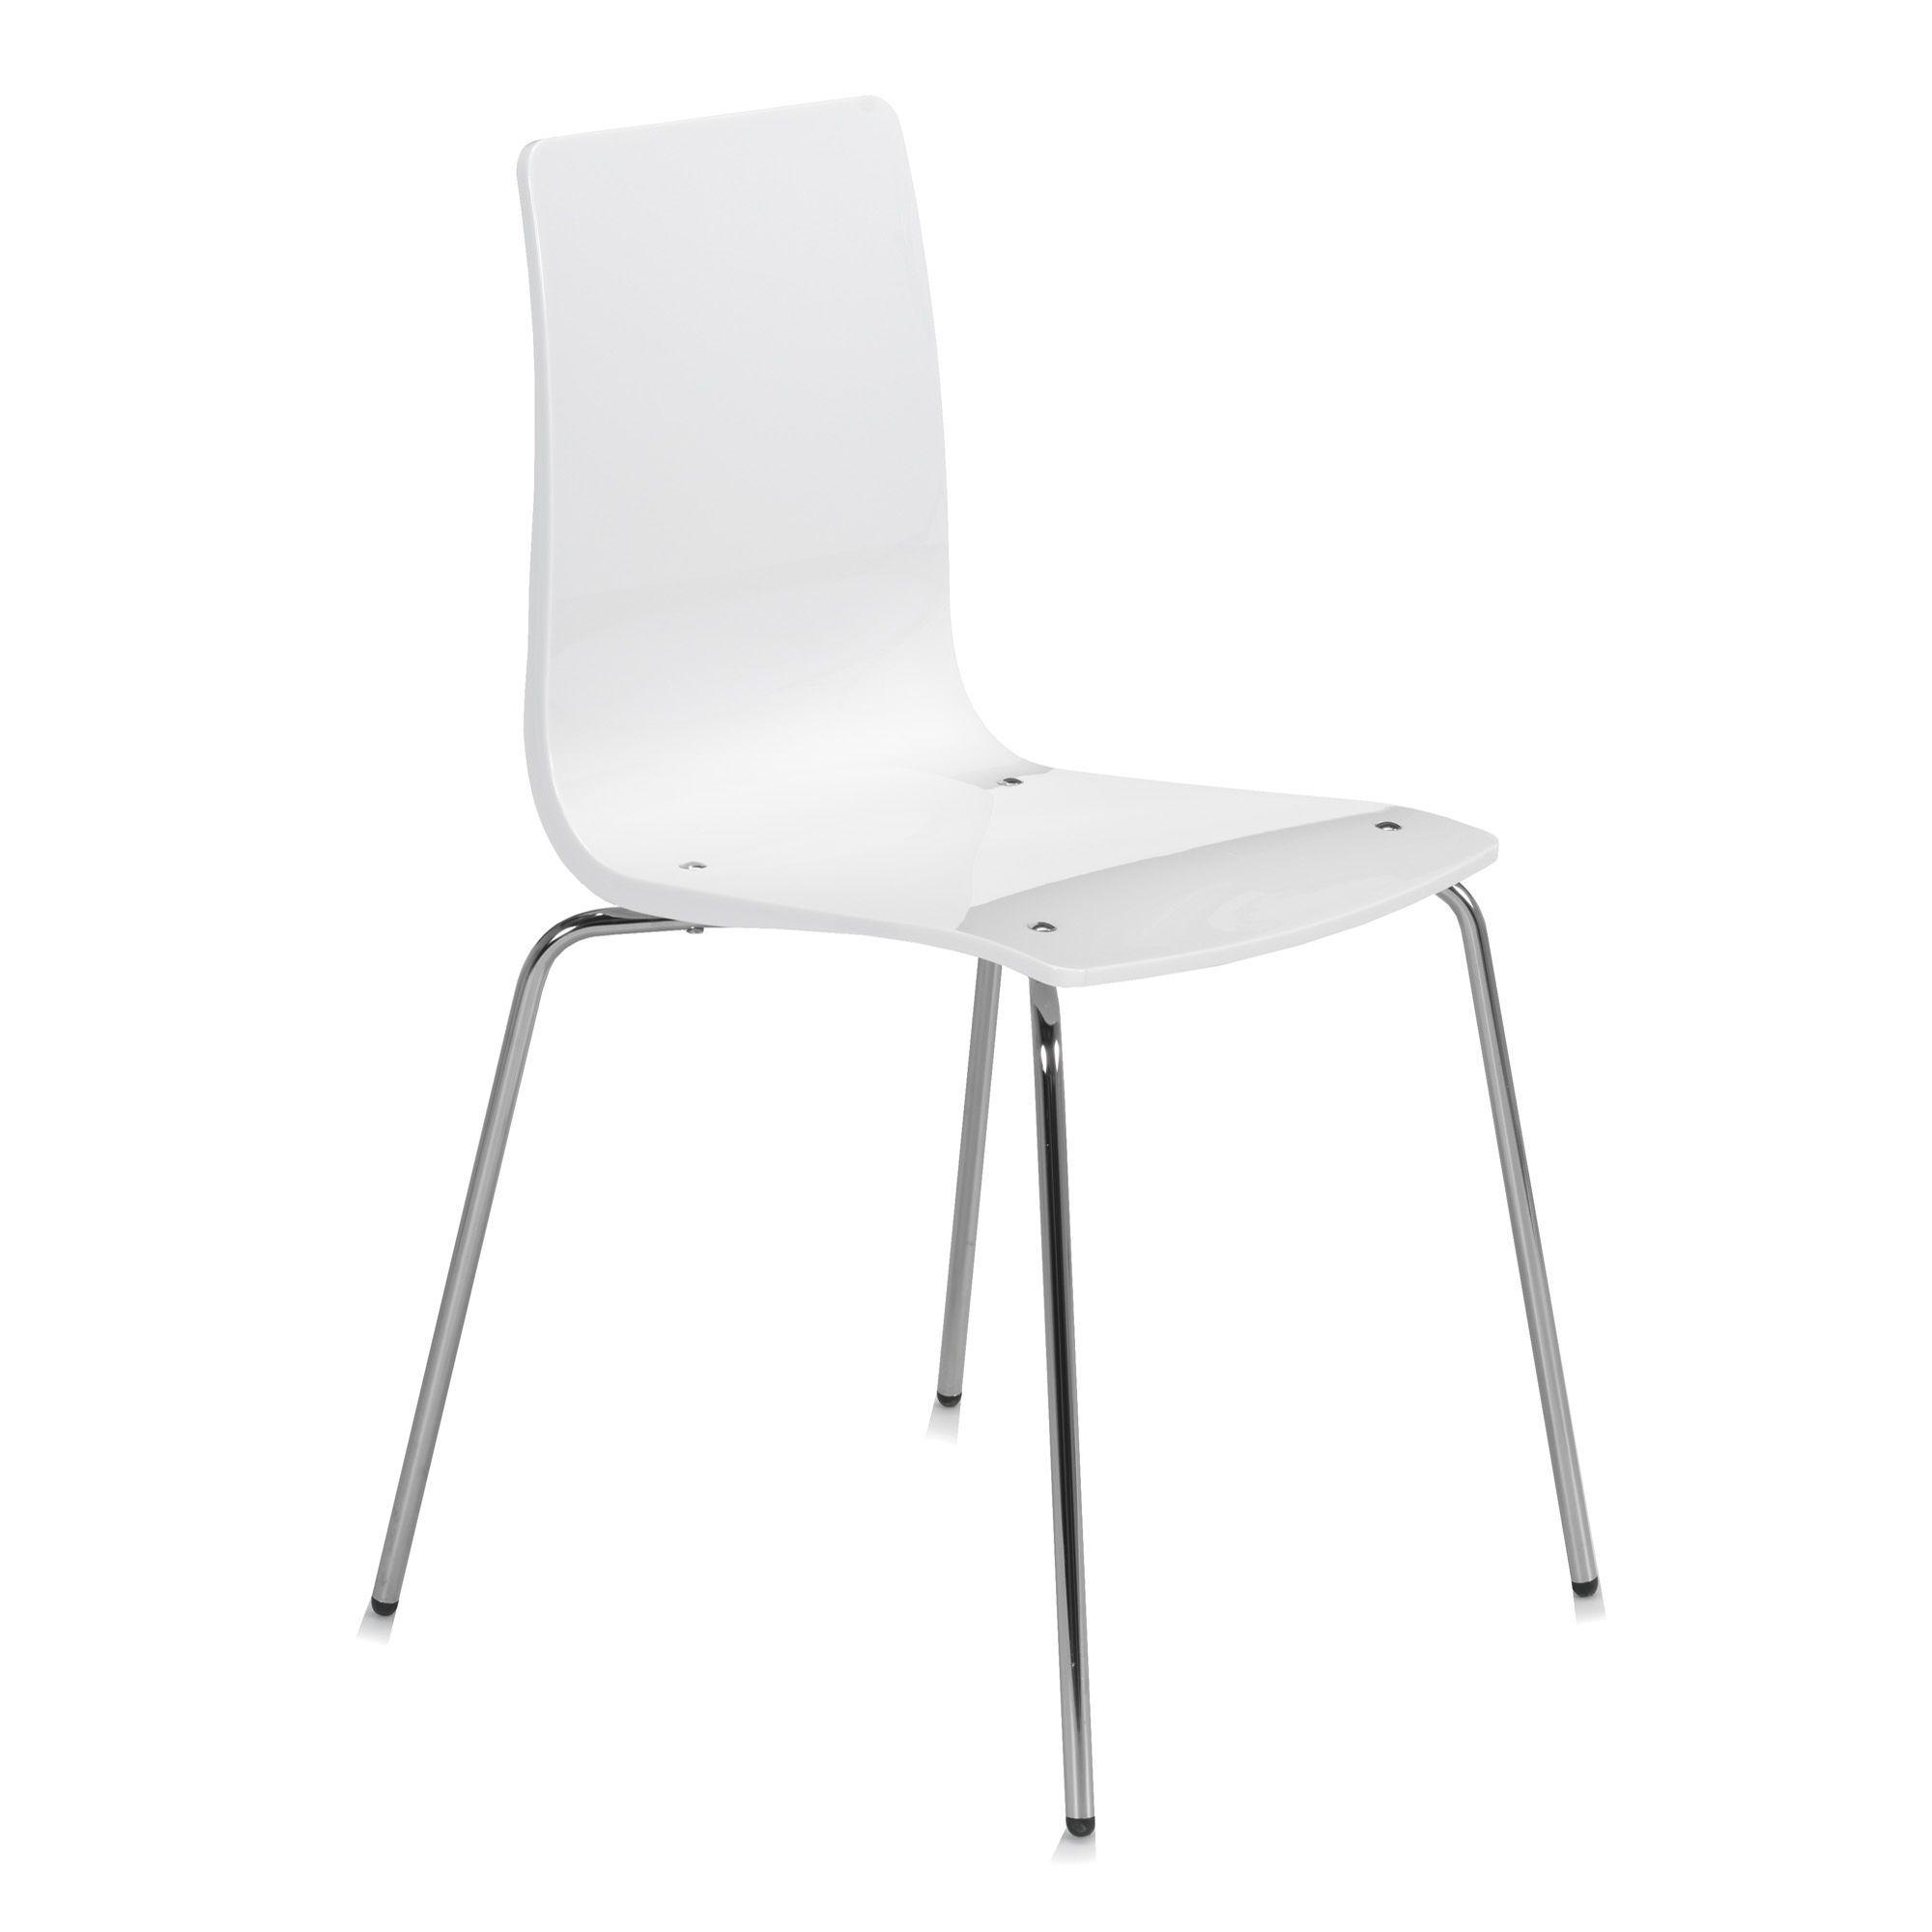 Chaises Alinea Salle A Manger: Chaise Design Blanche Blanc